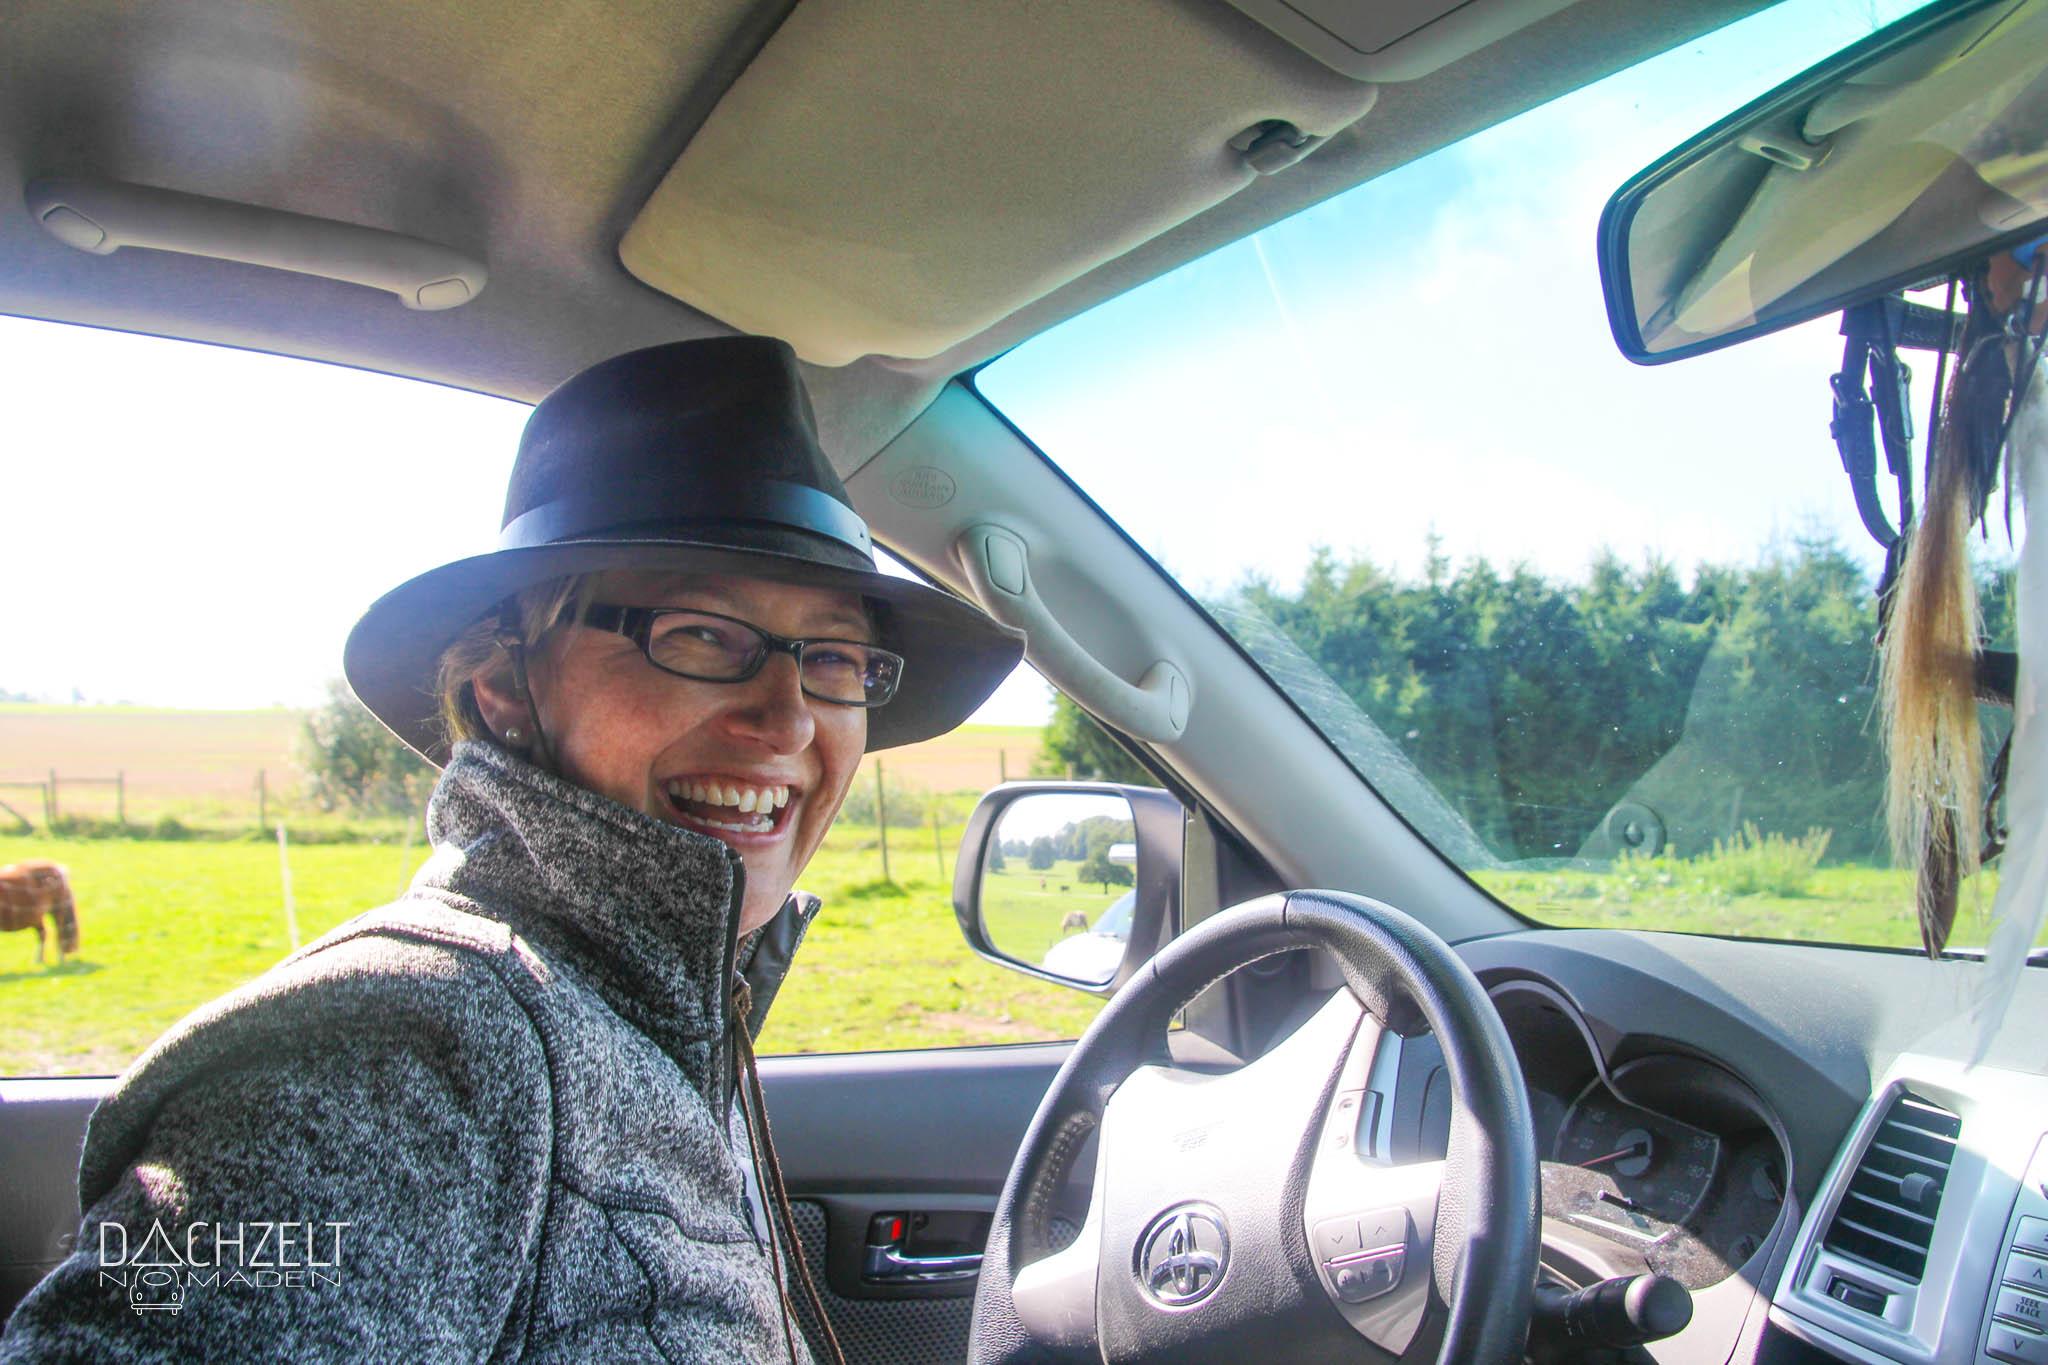 Dachzeltnomadentreffen 2017   Offroad   Birgit Hofmann